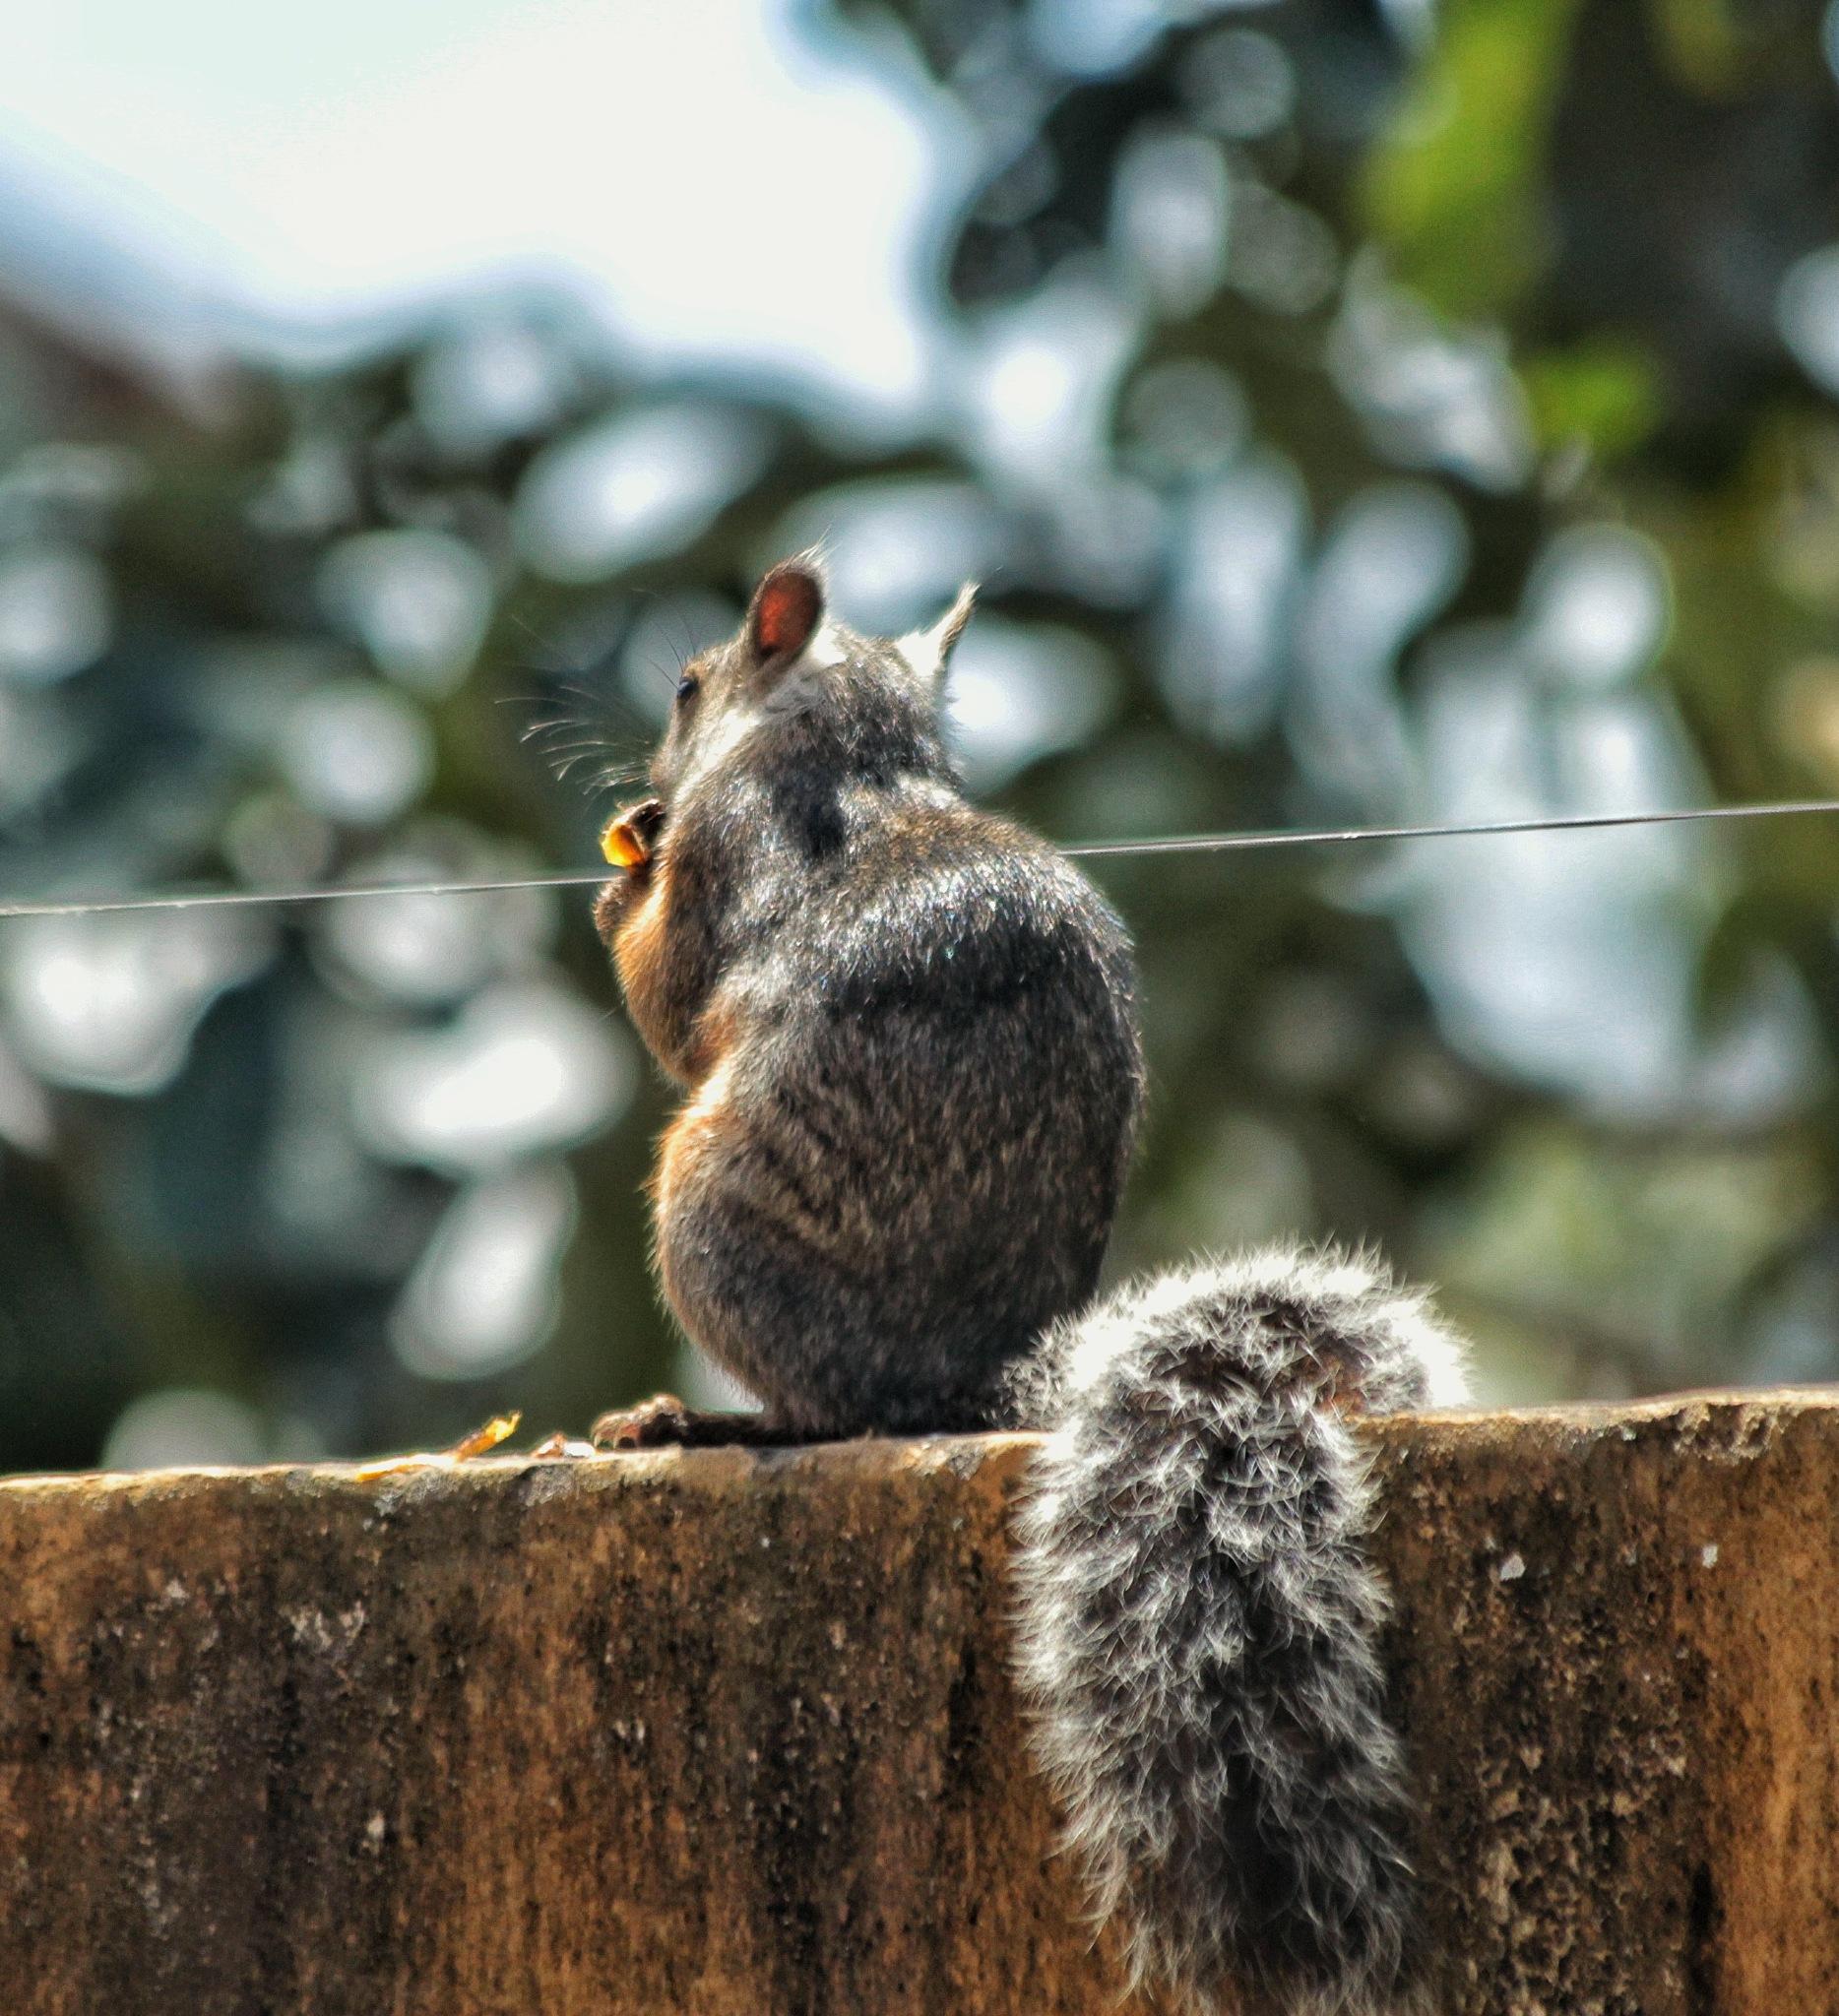 #squirrel by Jorge Monge